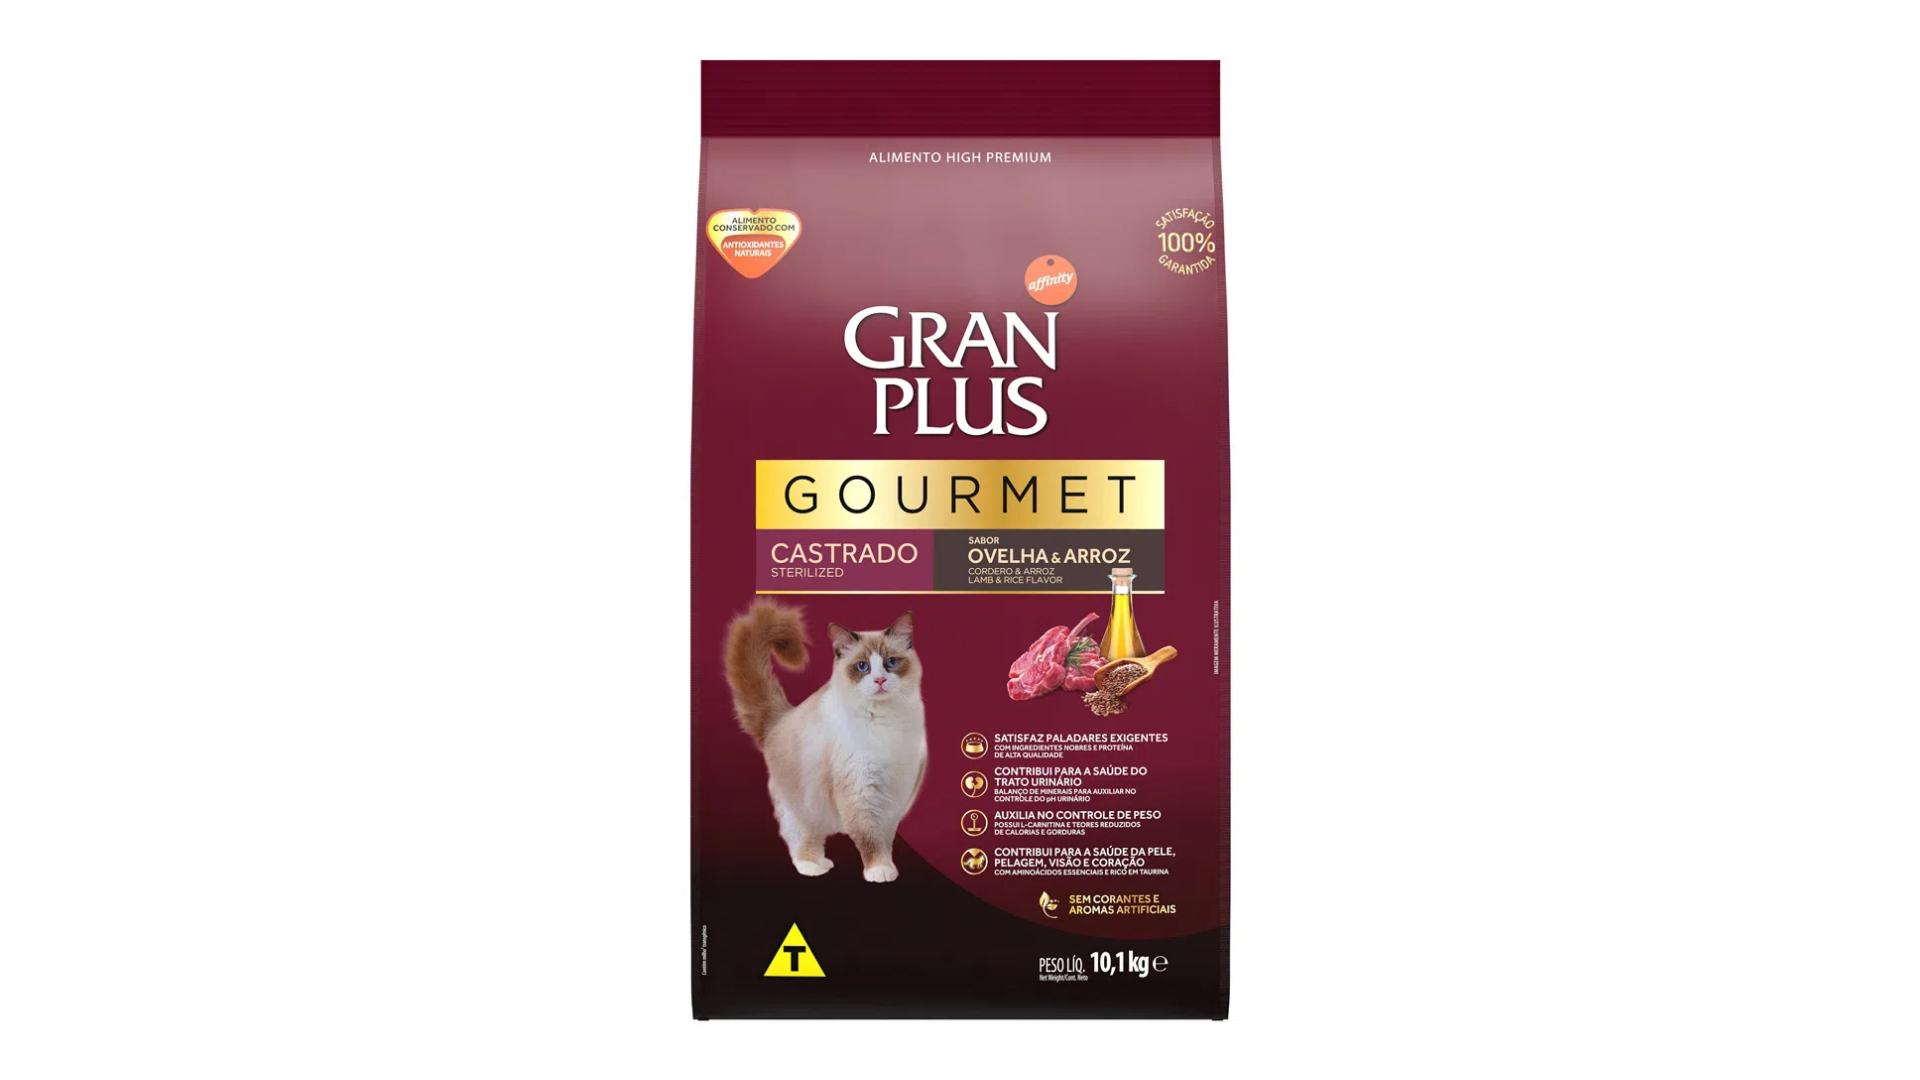 GranPlus Gourmet Sterilised (Imagem: Divulgação: GranPlus)